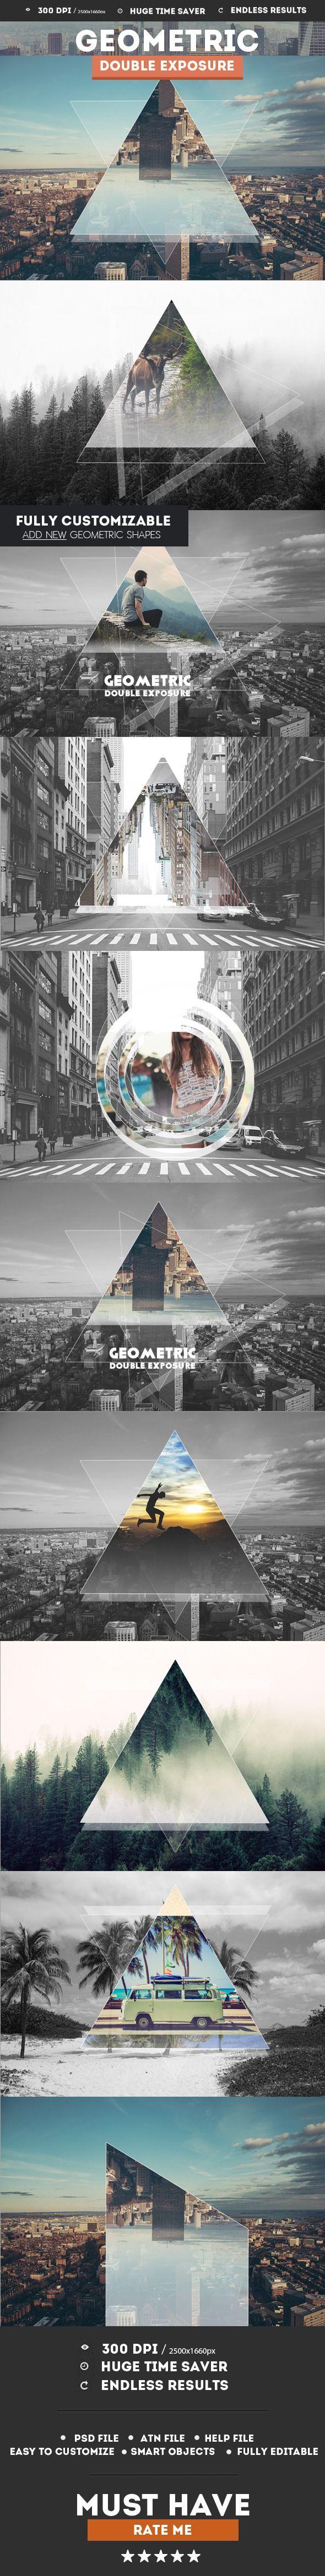 Geometric Double Exposure Photoshop Creator. Photoshop tips. Nordic360.